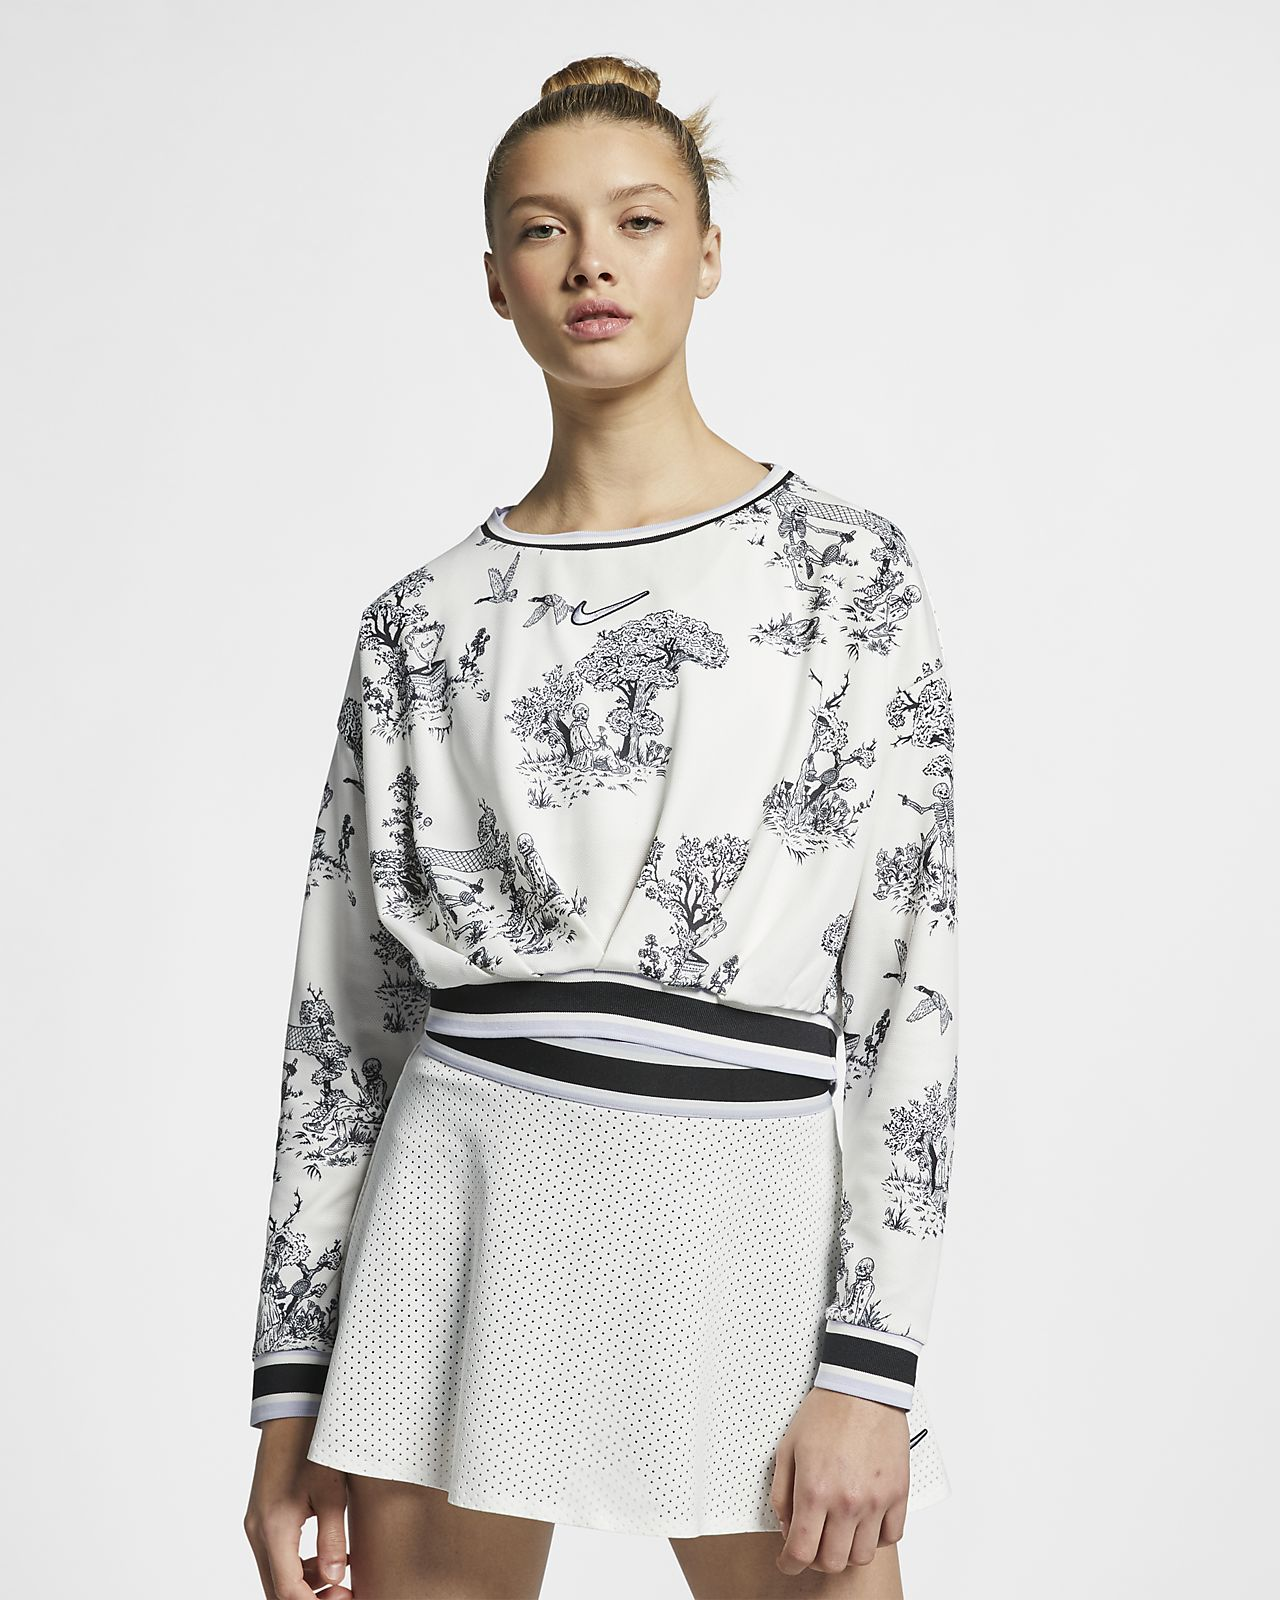 Camisola de ténis de manga comprida NikeCourt Dri-FIT para mulher